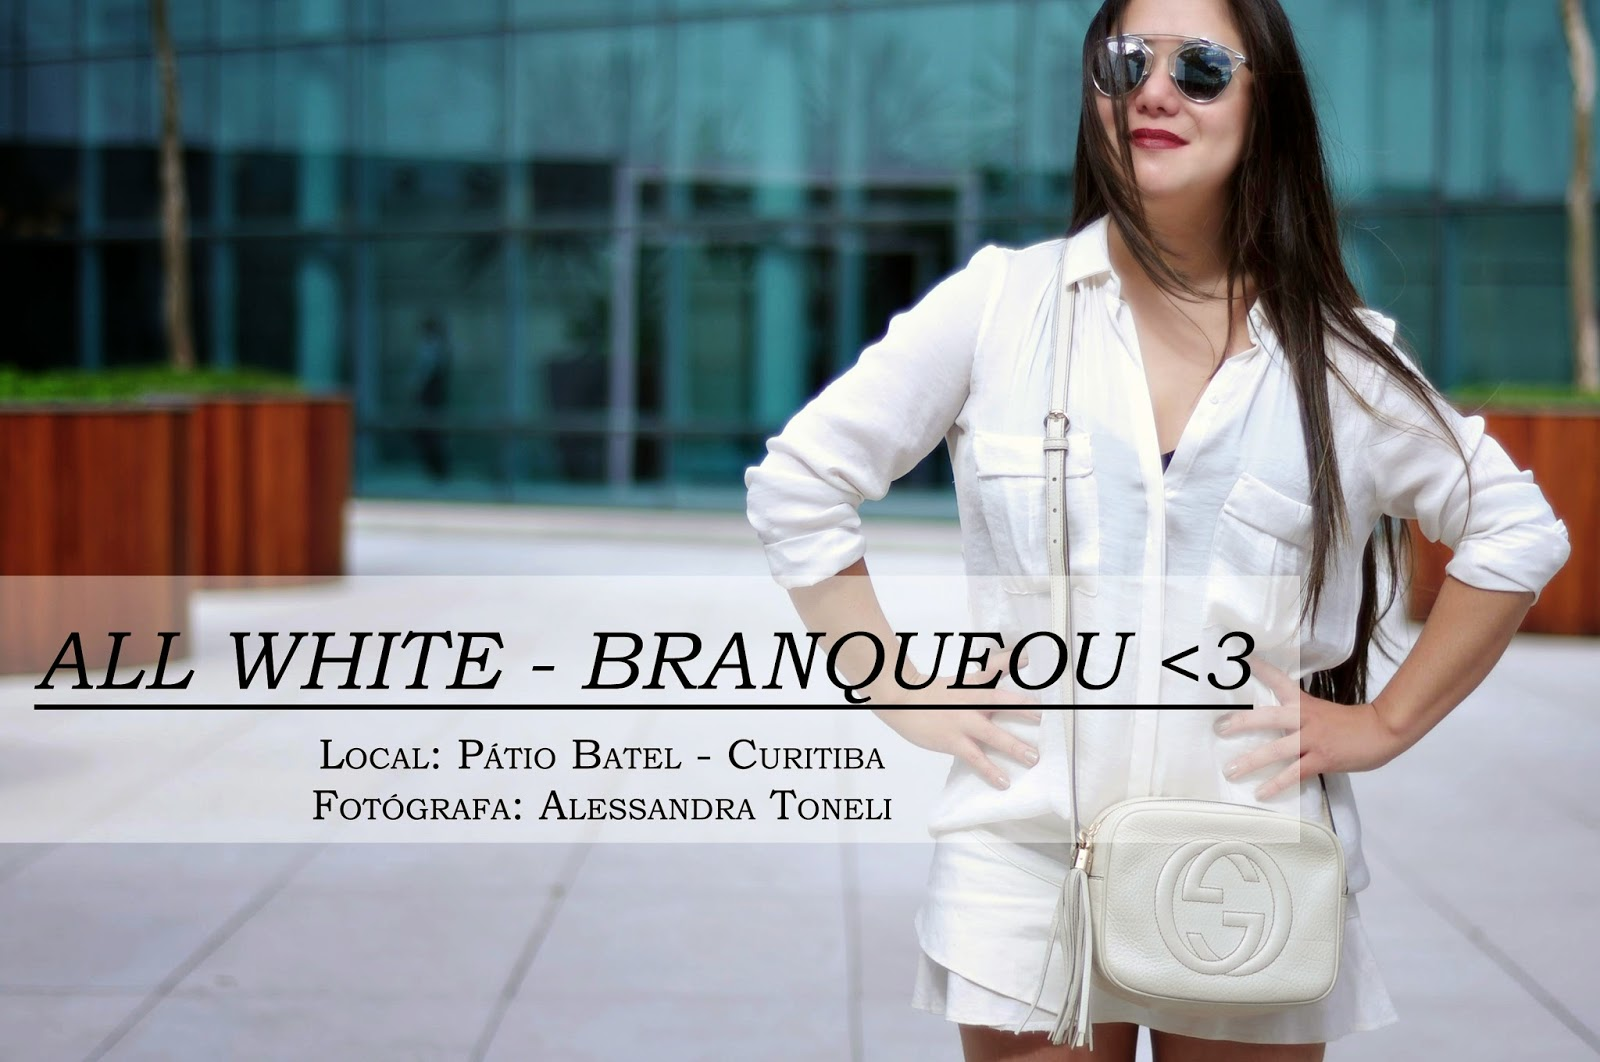 OOTD - ALL WHITE - Saia Branca + Camisa Branca + Bolsa Branca